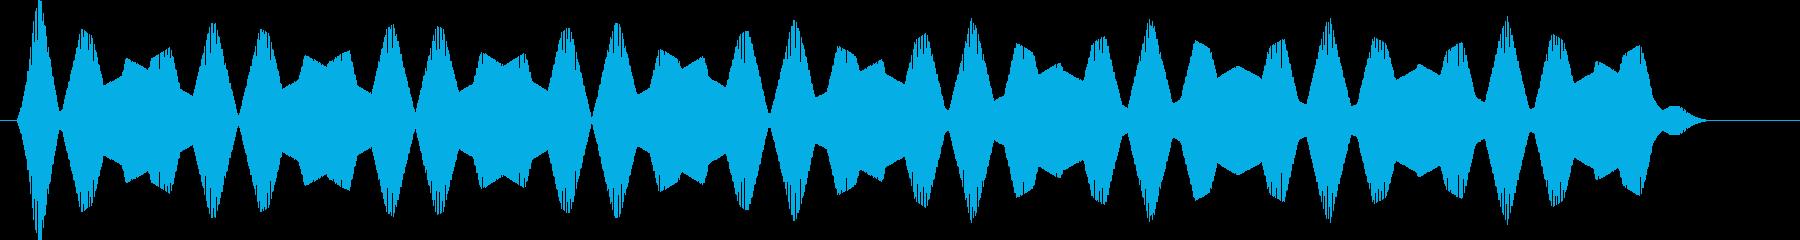 UFOが現れた効果音の再生済みの波形